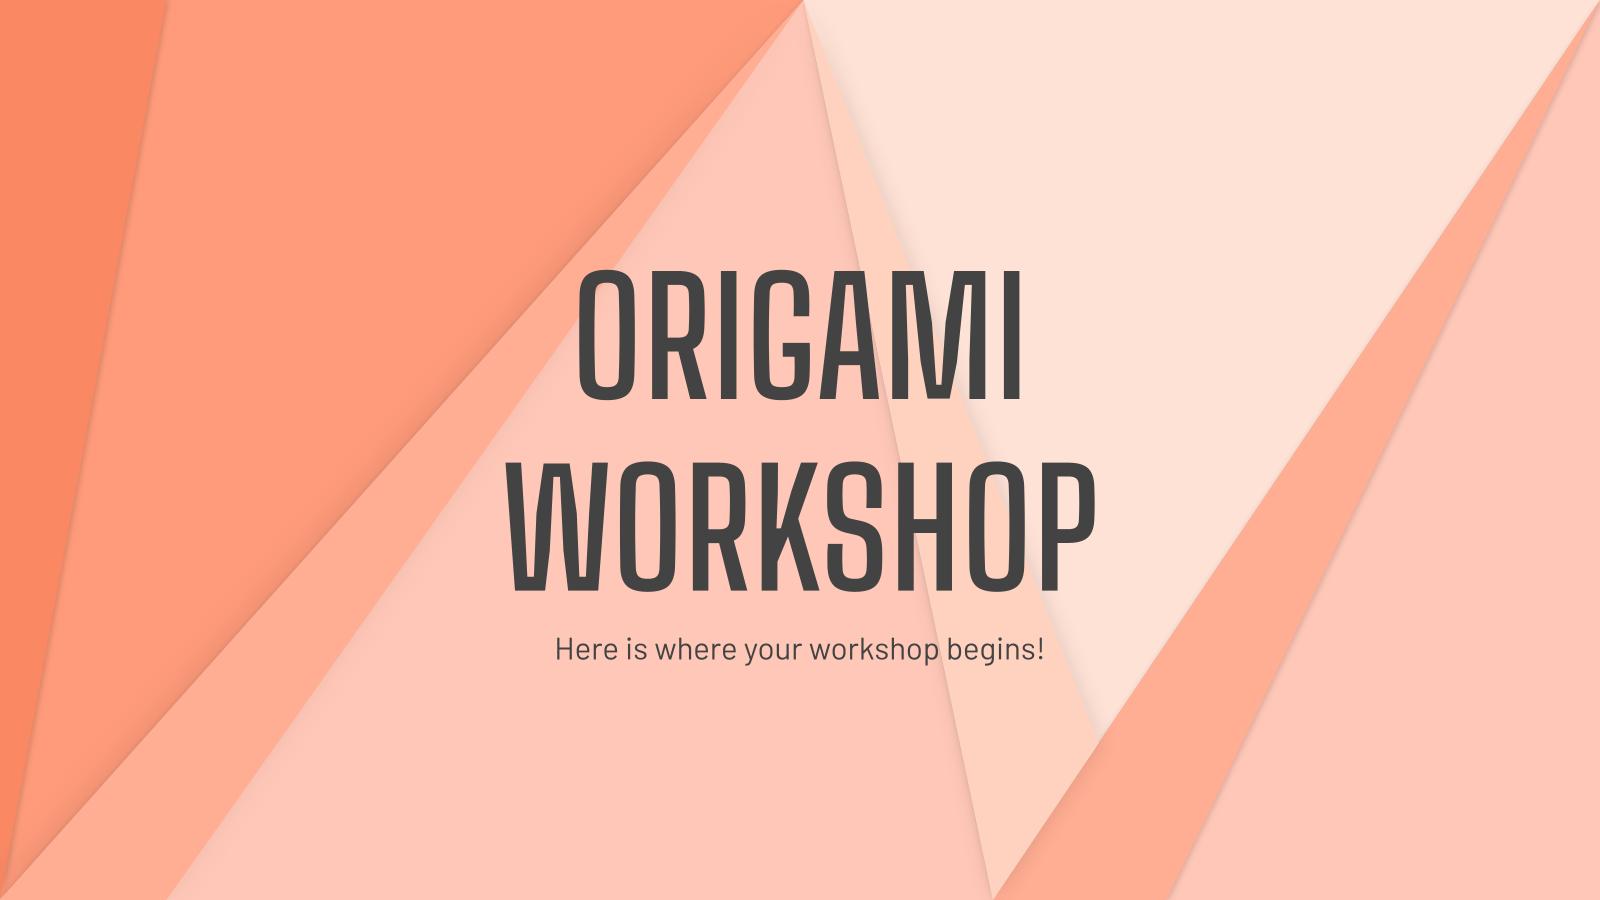 Origami Workshop presentation template